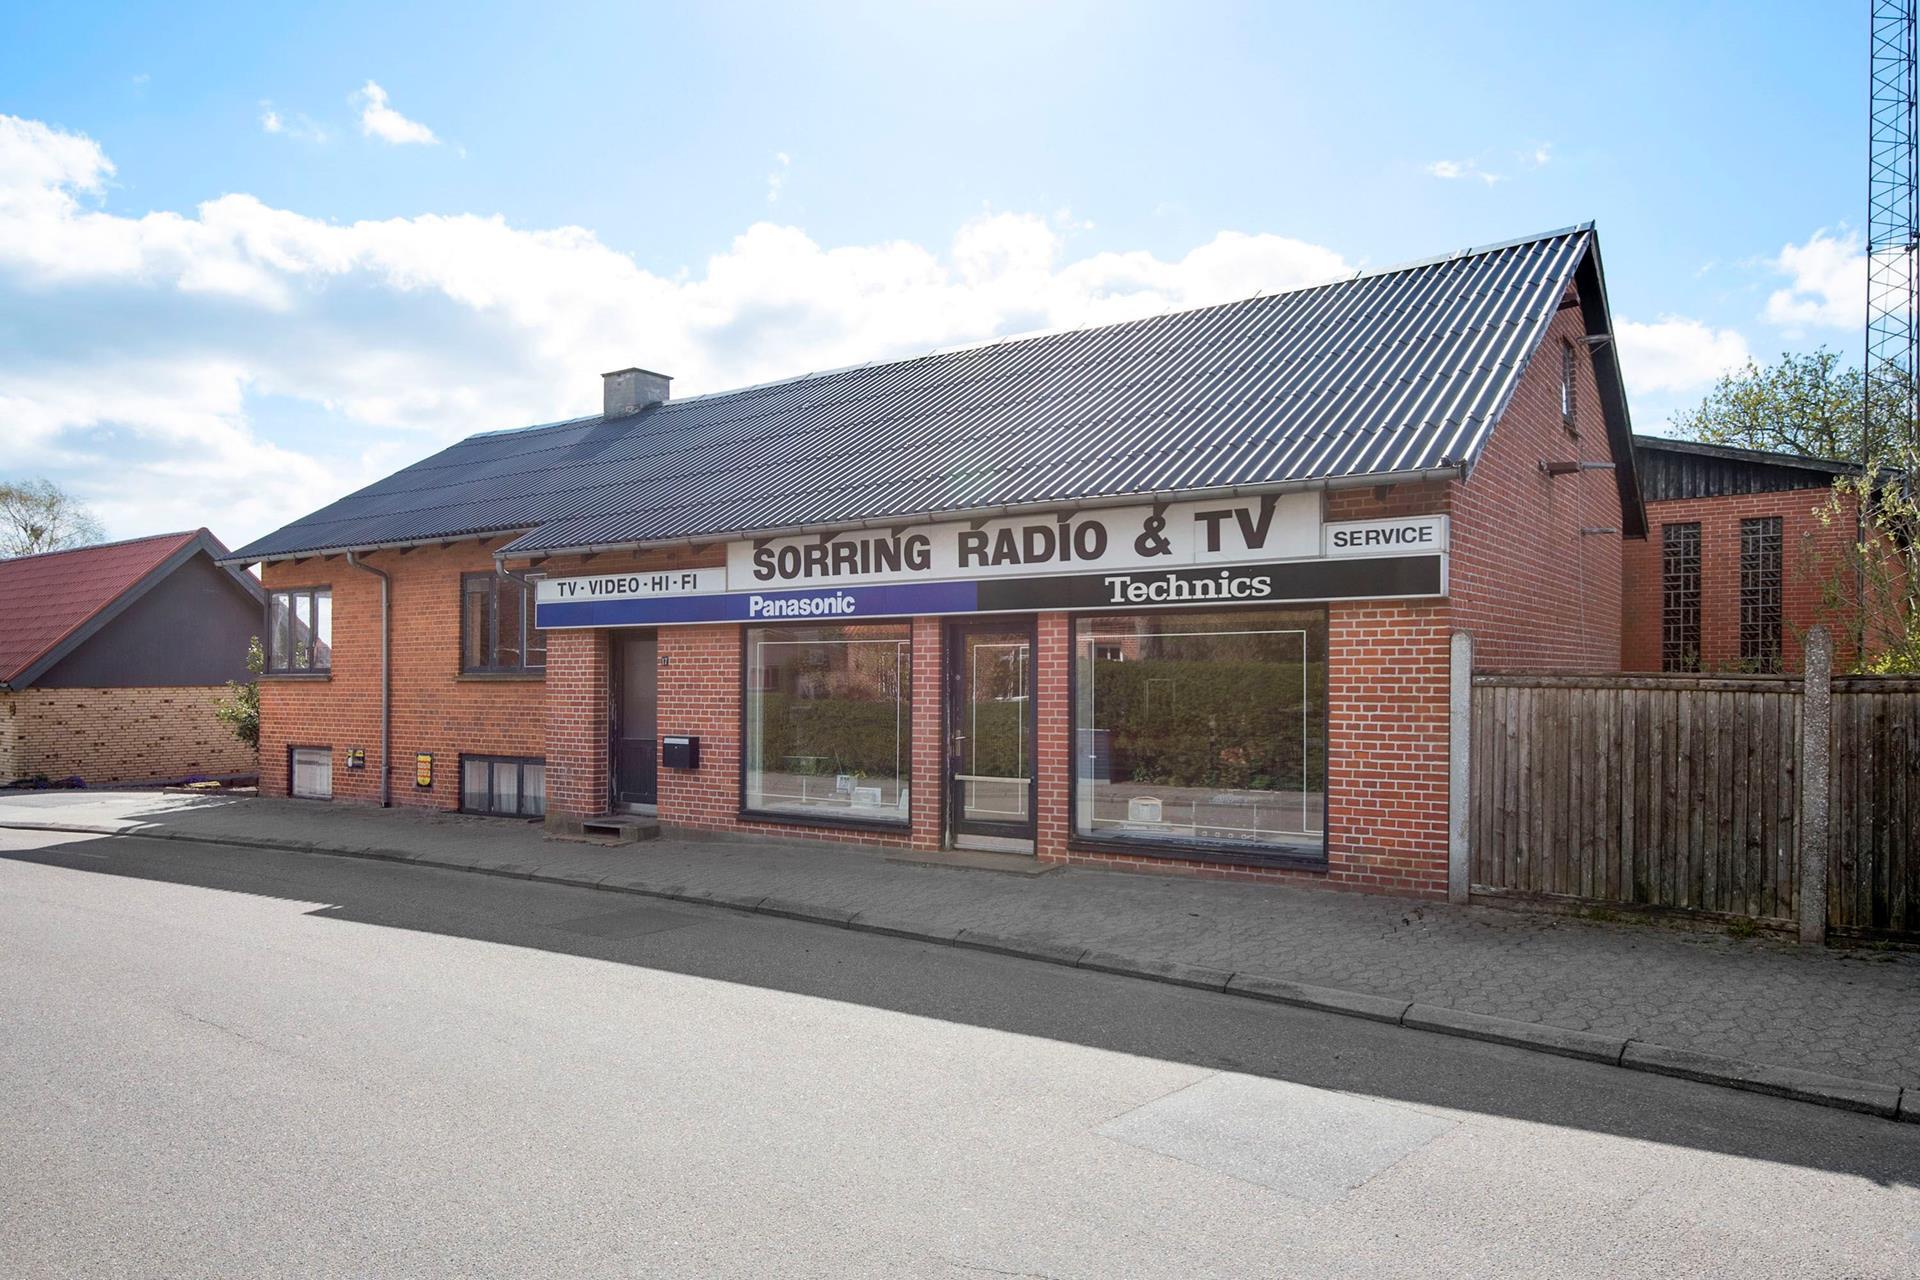 Bolig/erhverv på Ebbesensvej i Sorring - Andet